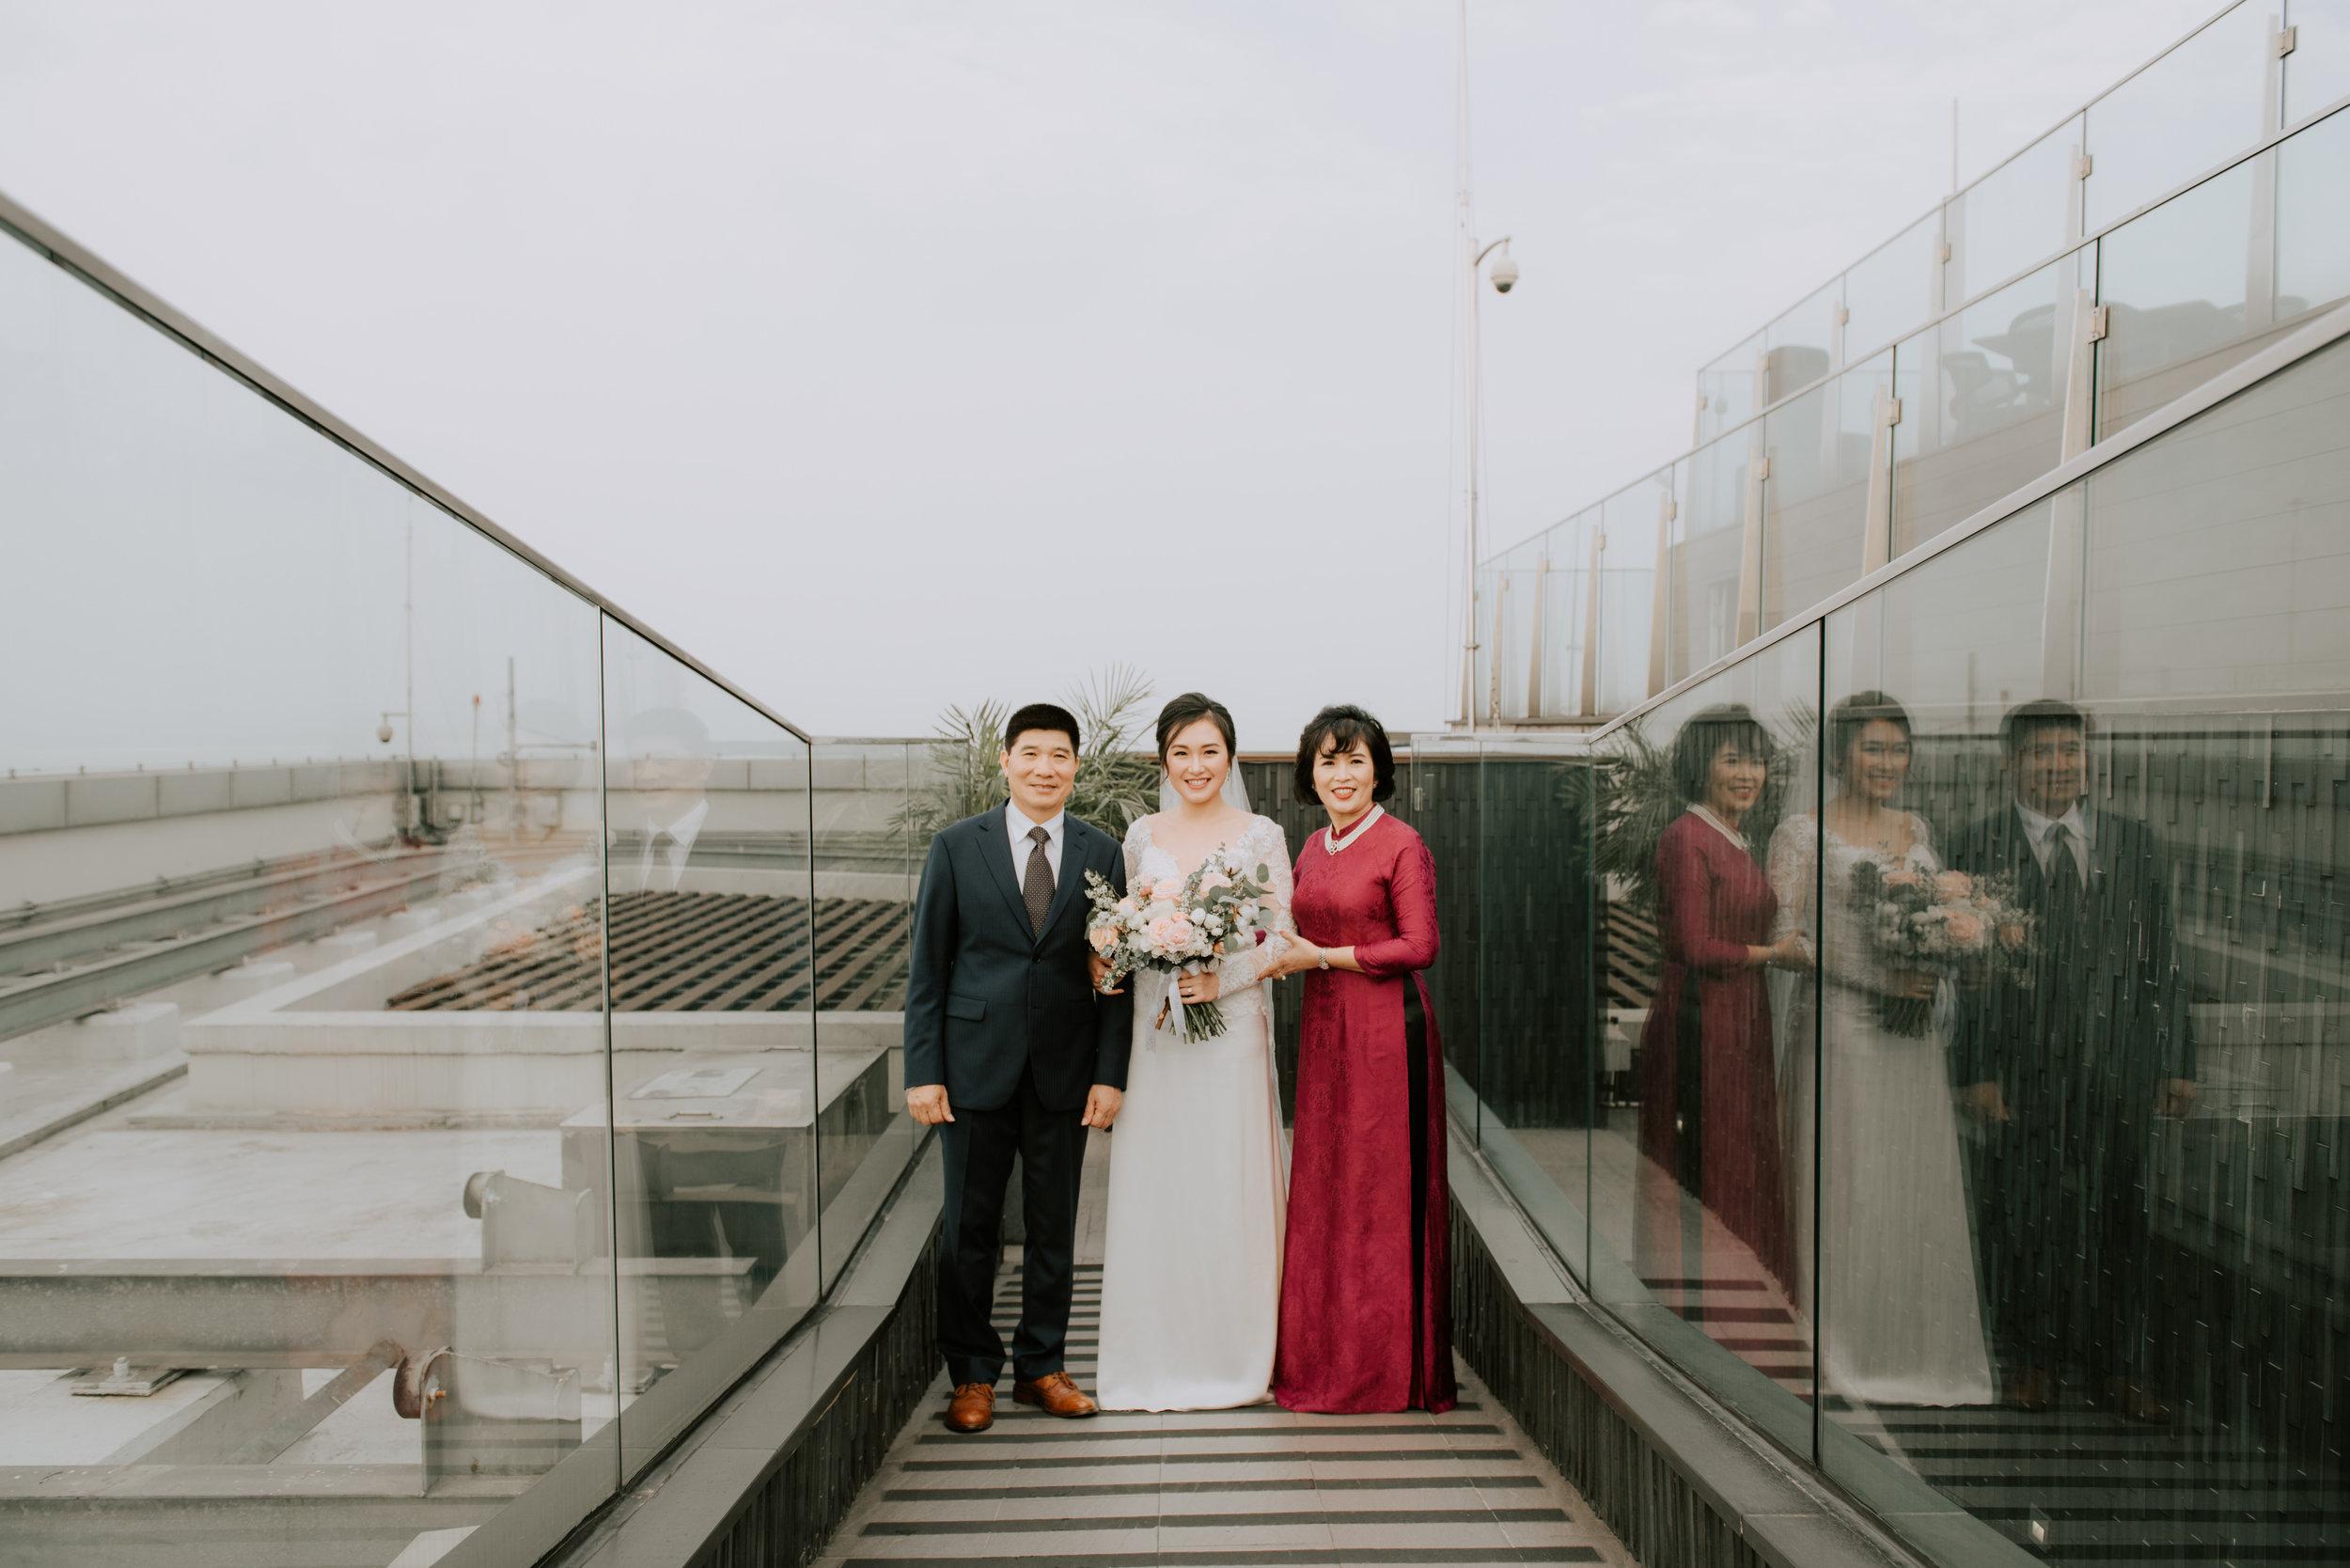 Mirrorwedding Destination Photographer TopofHanoi Duc Anh Hien Trang 163617.jpg